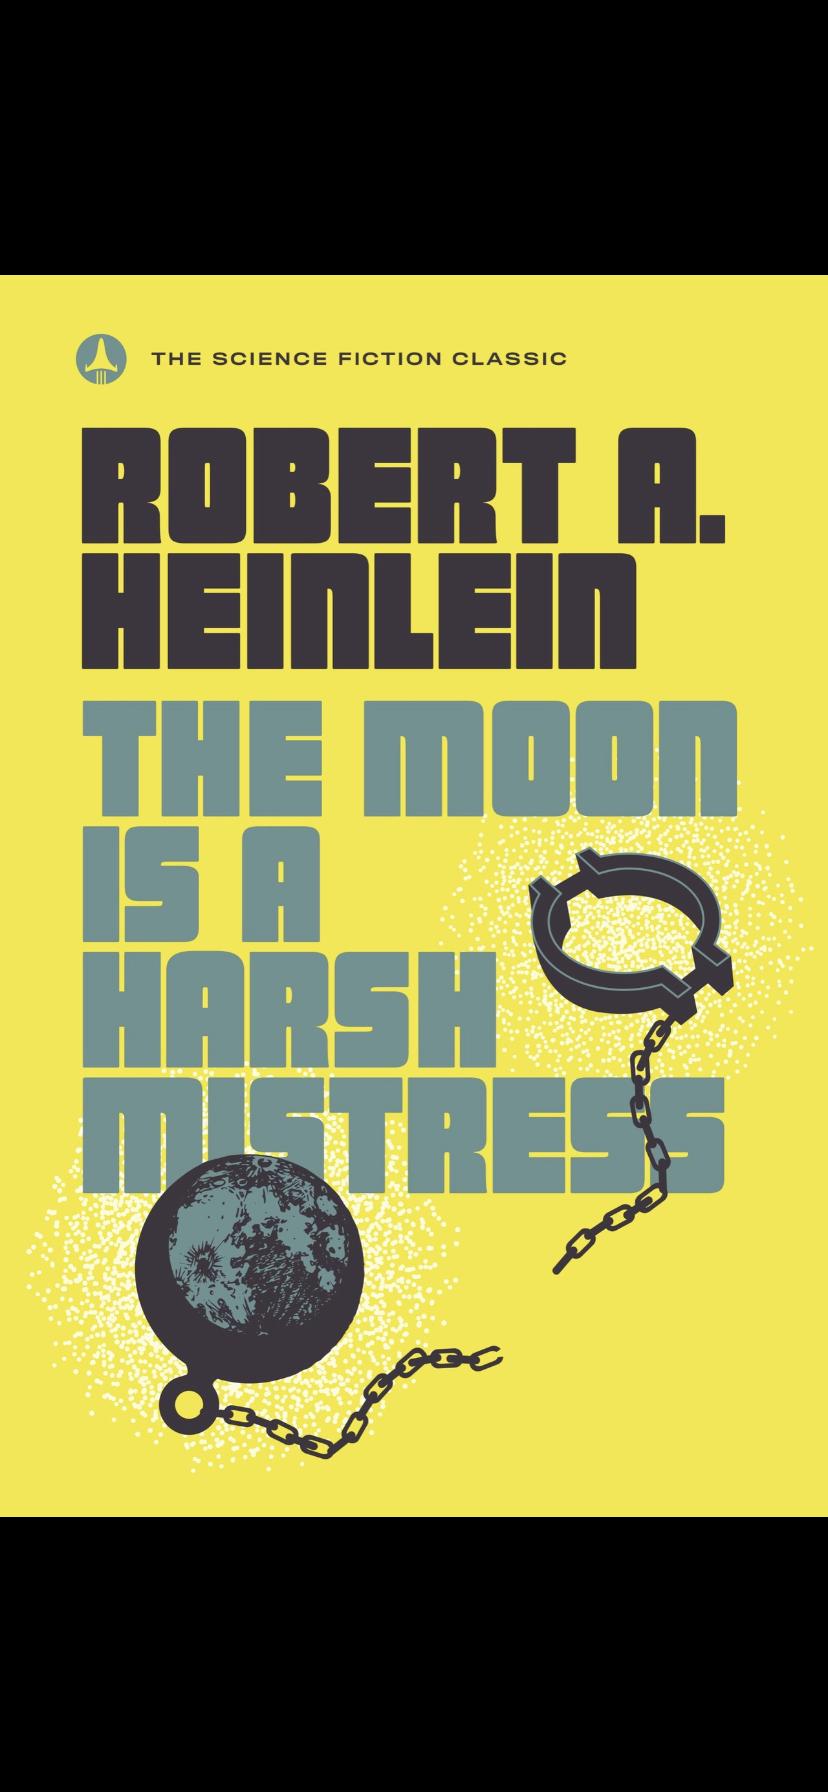 Robert L. Heinlein - The Moon Is A Harsh Mistress